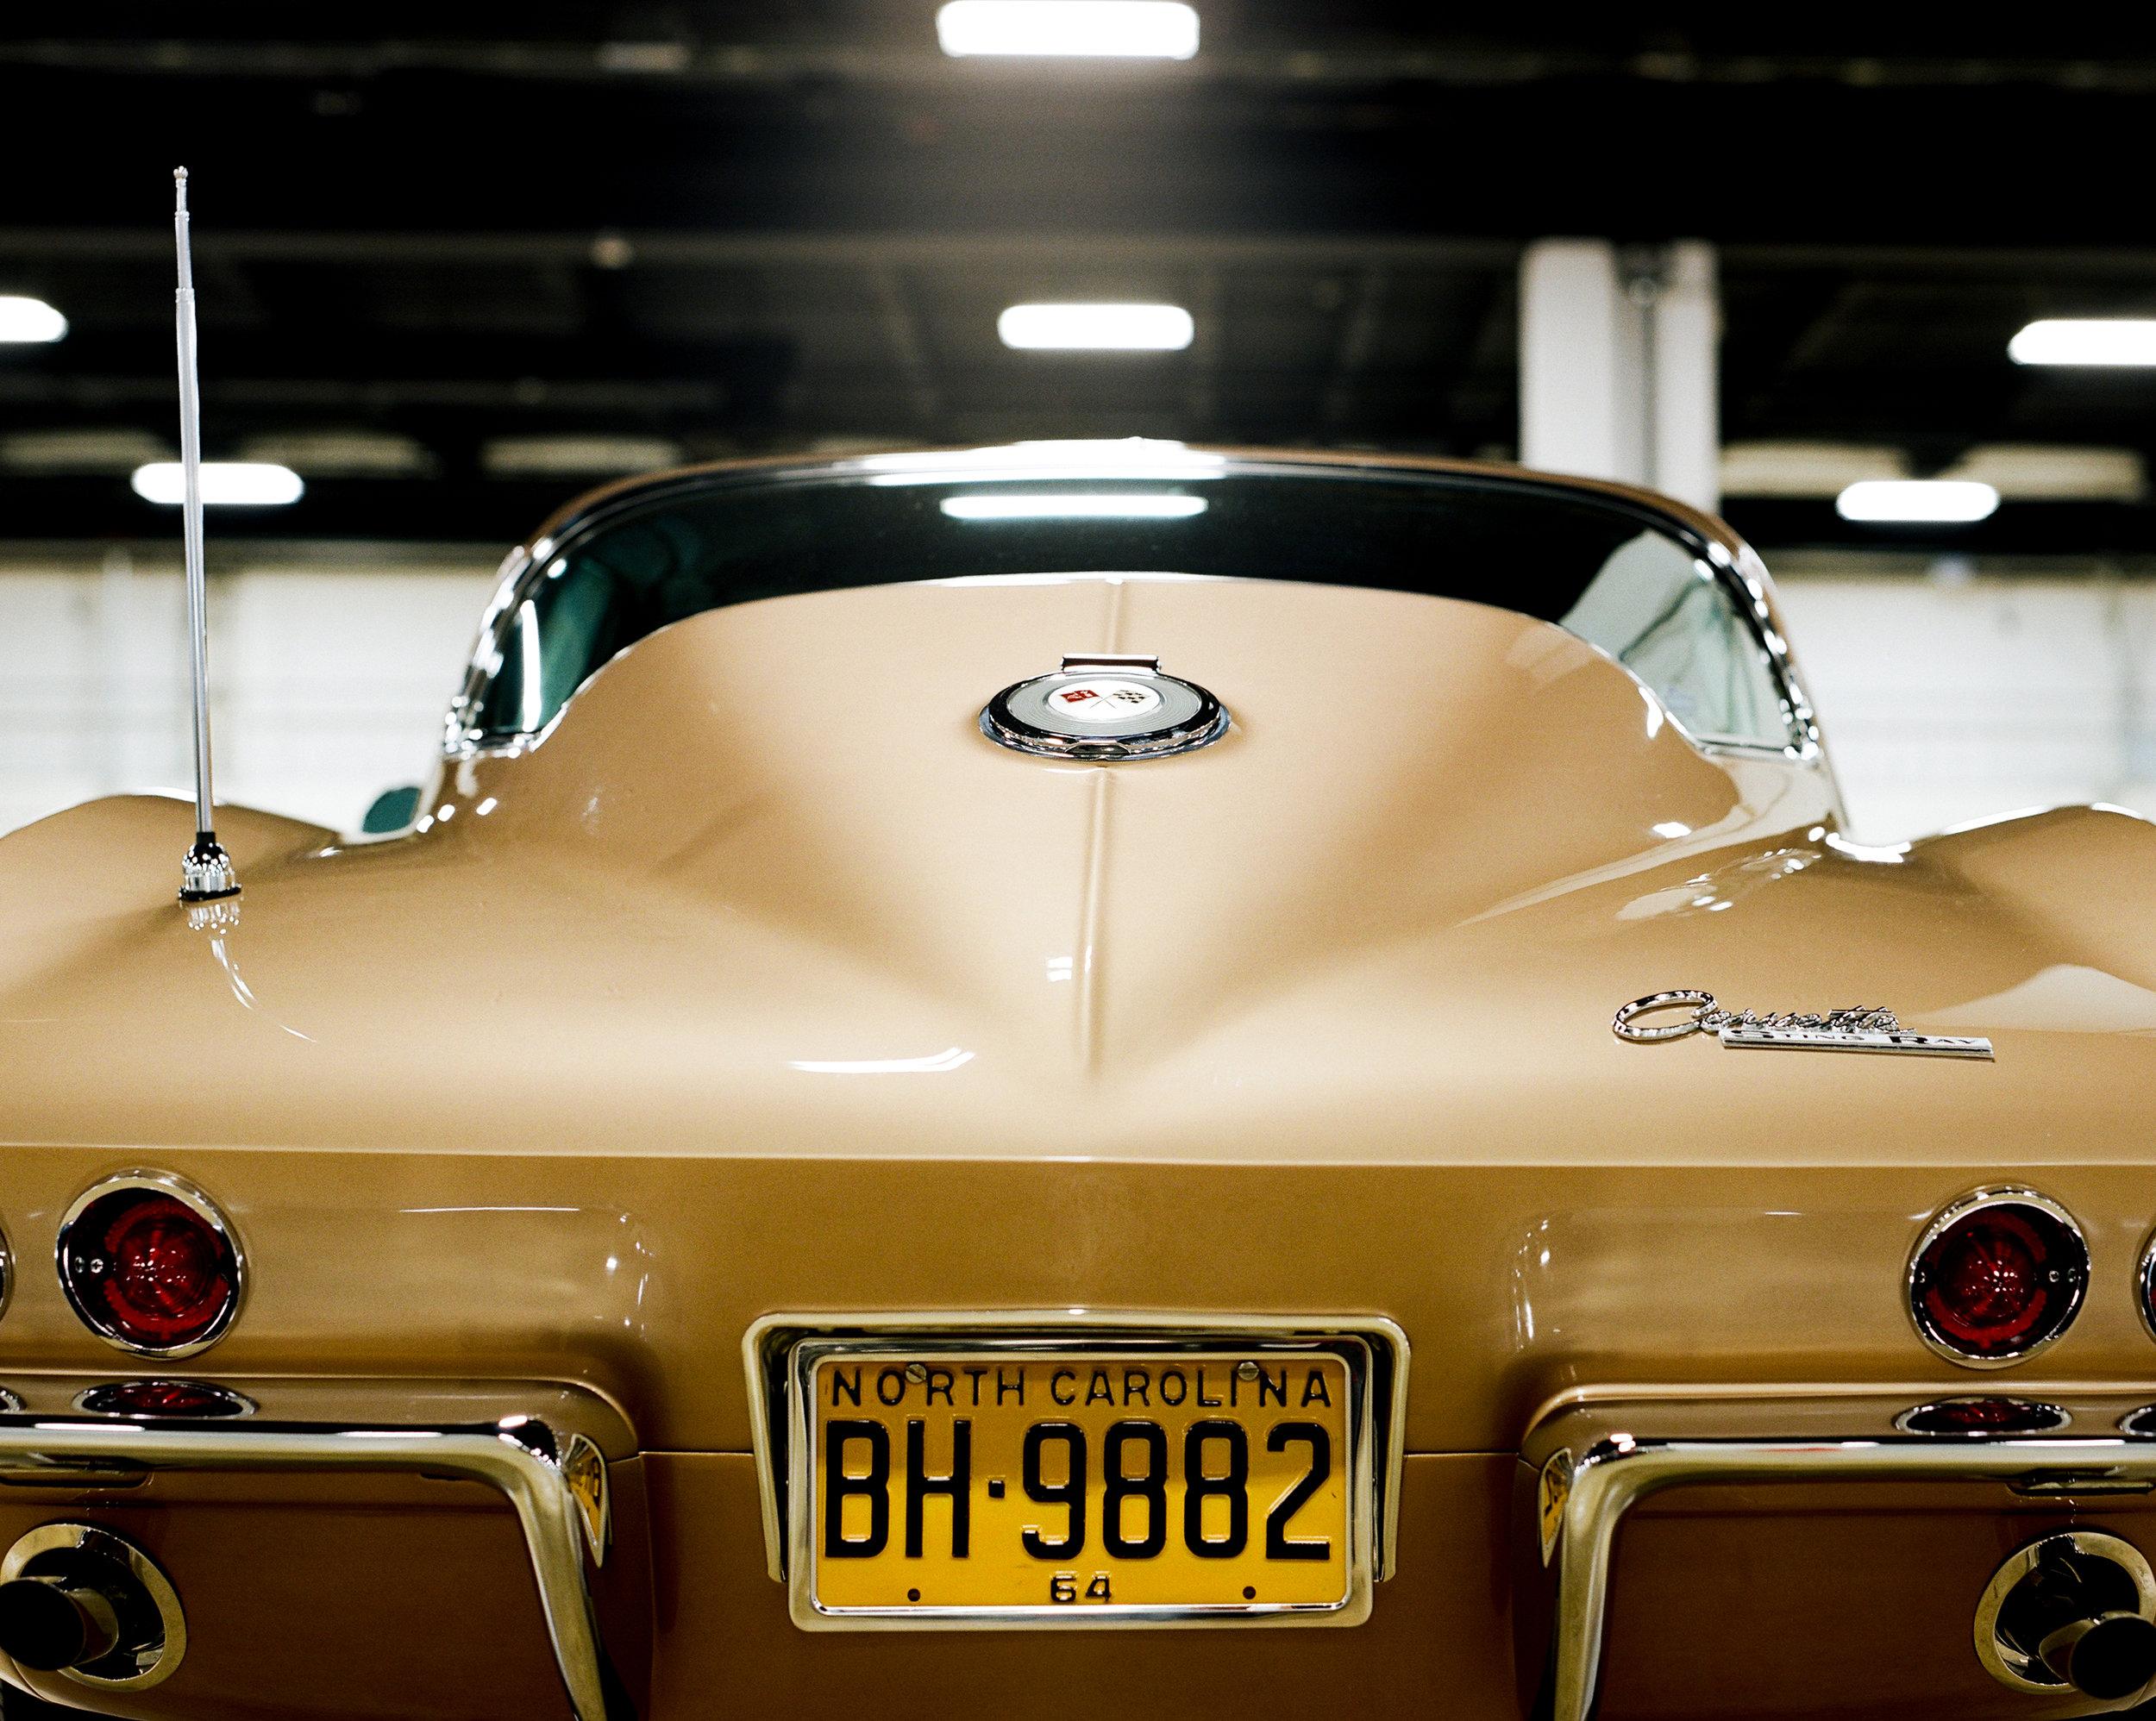 1964 Saddle Tan Corvette Rear End